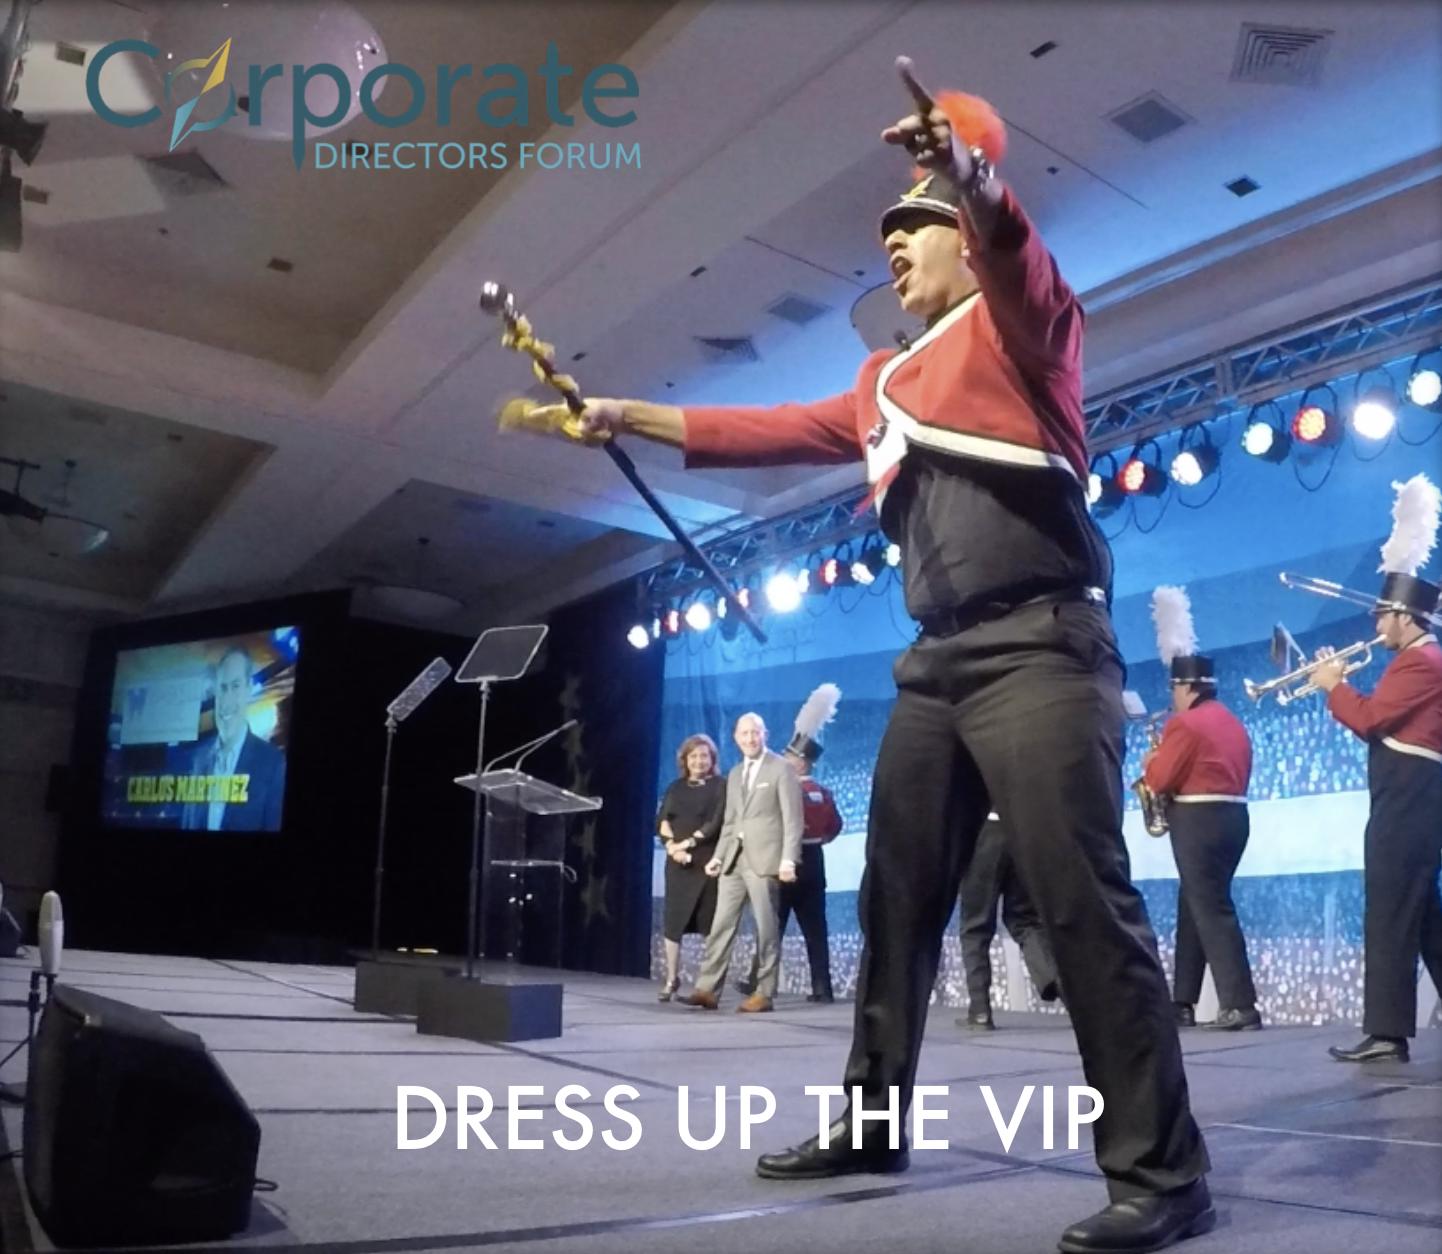 Dress up the VIP